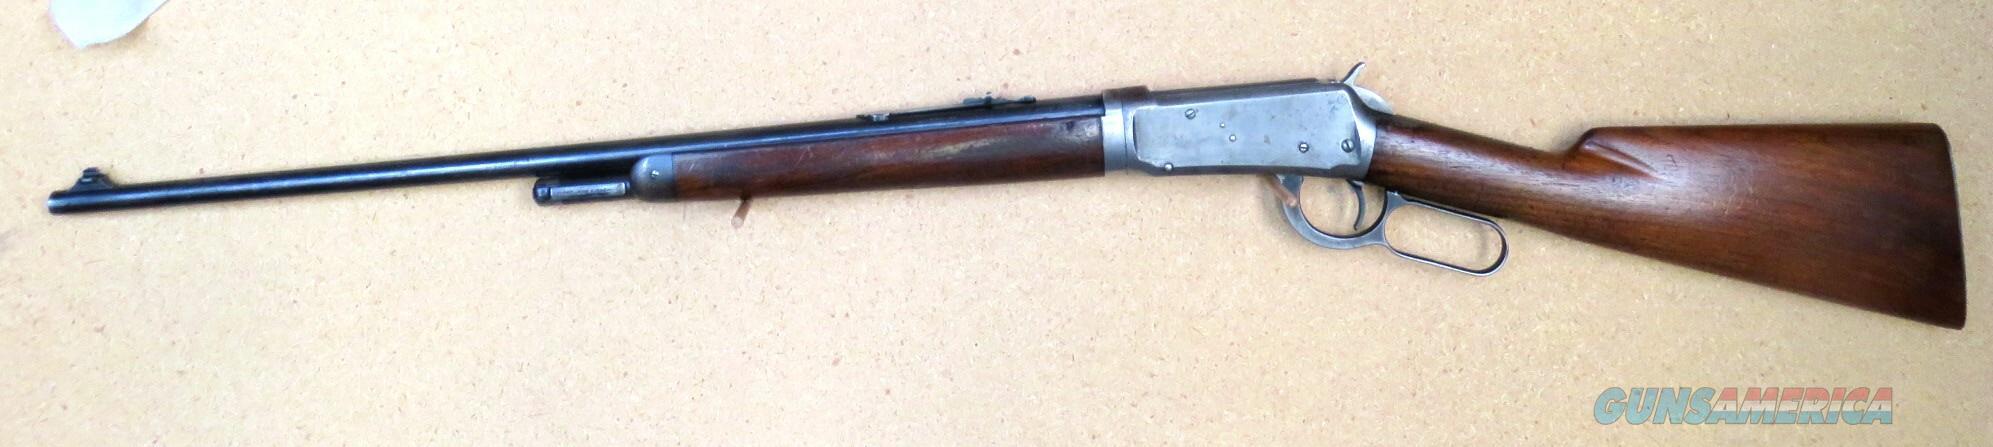 Winchester Model 55, 1/2 Magazine, Take Down. .30-30 WCF,  PRICE REDUCED  Guns > Rifles > Winchester Rifles - Modern Lever > Model 94 > Pre-64